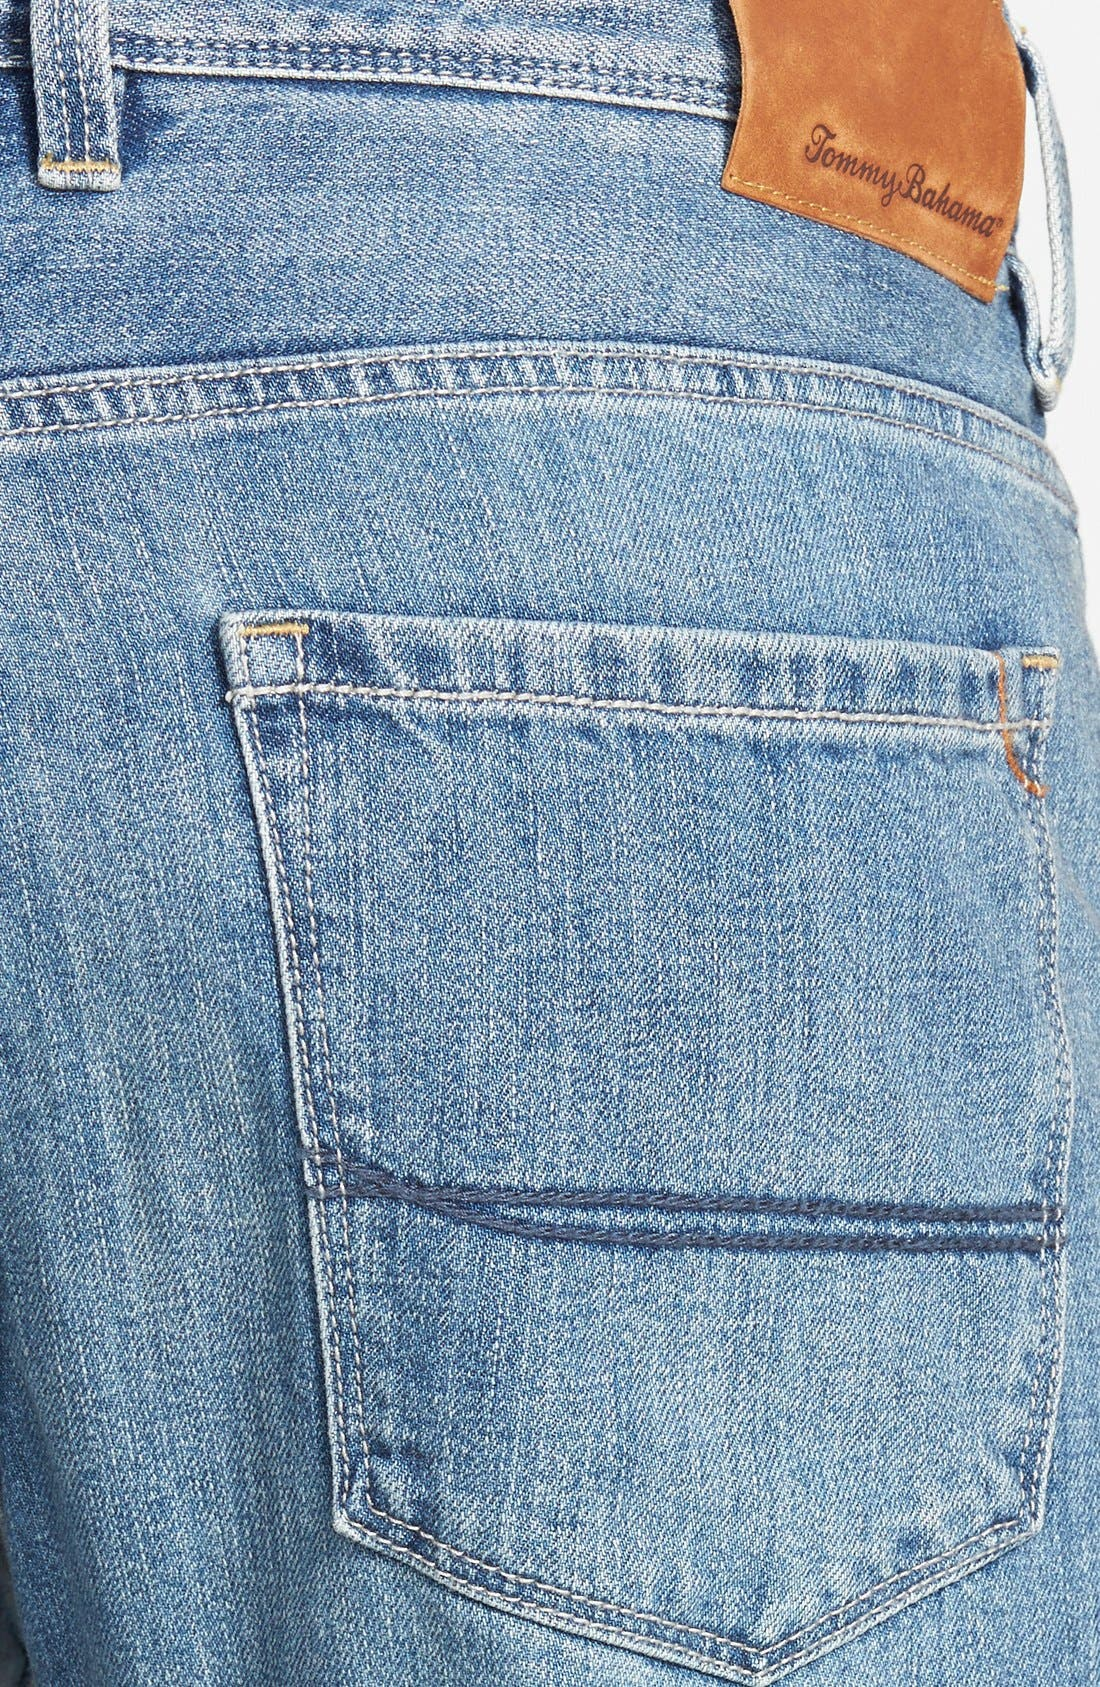 Alternate Image 2  - Tommy Bahama Denim 'Stevie' Standard Fit Jeans (Beach)